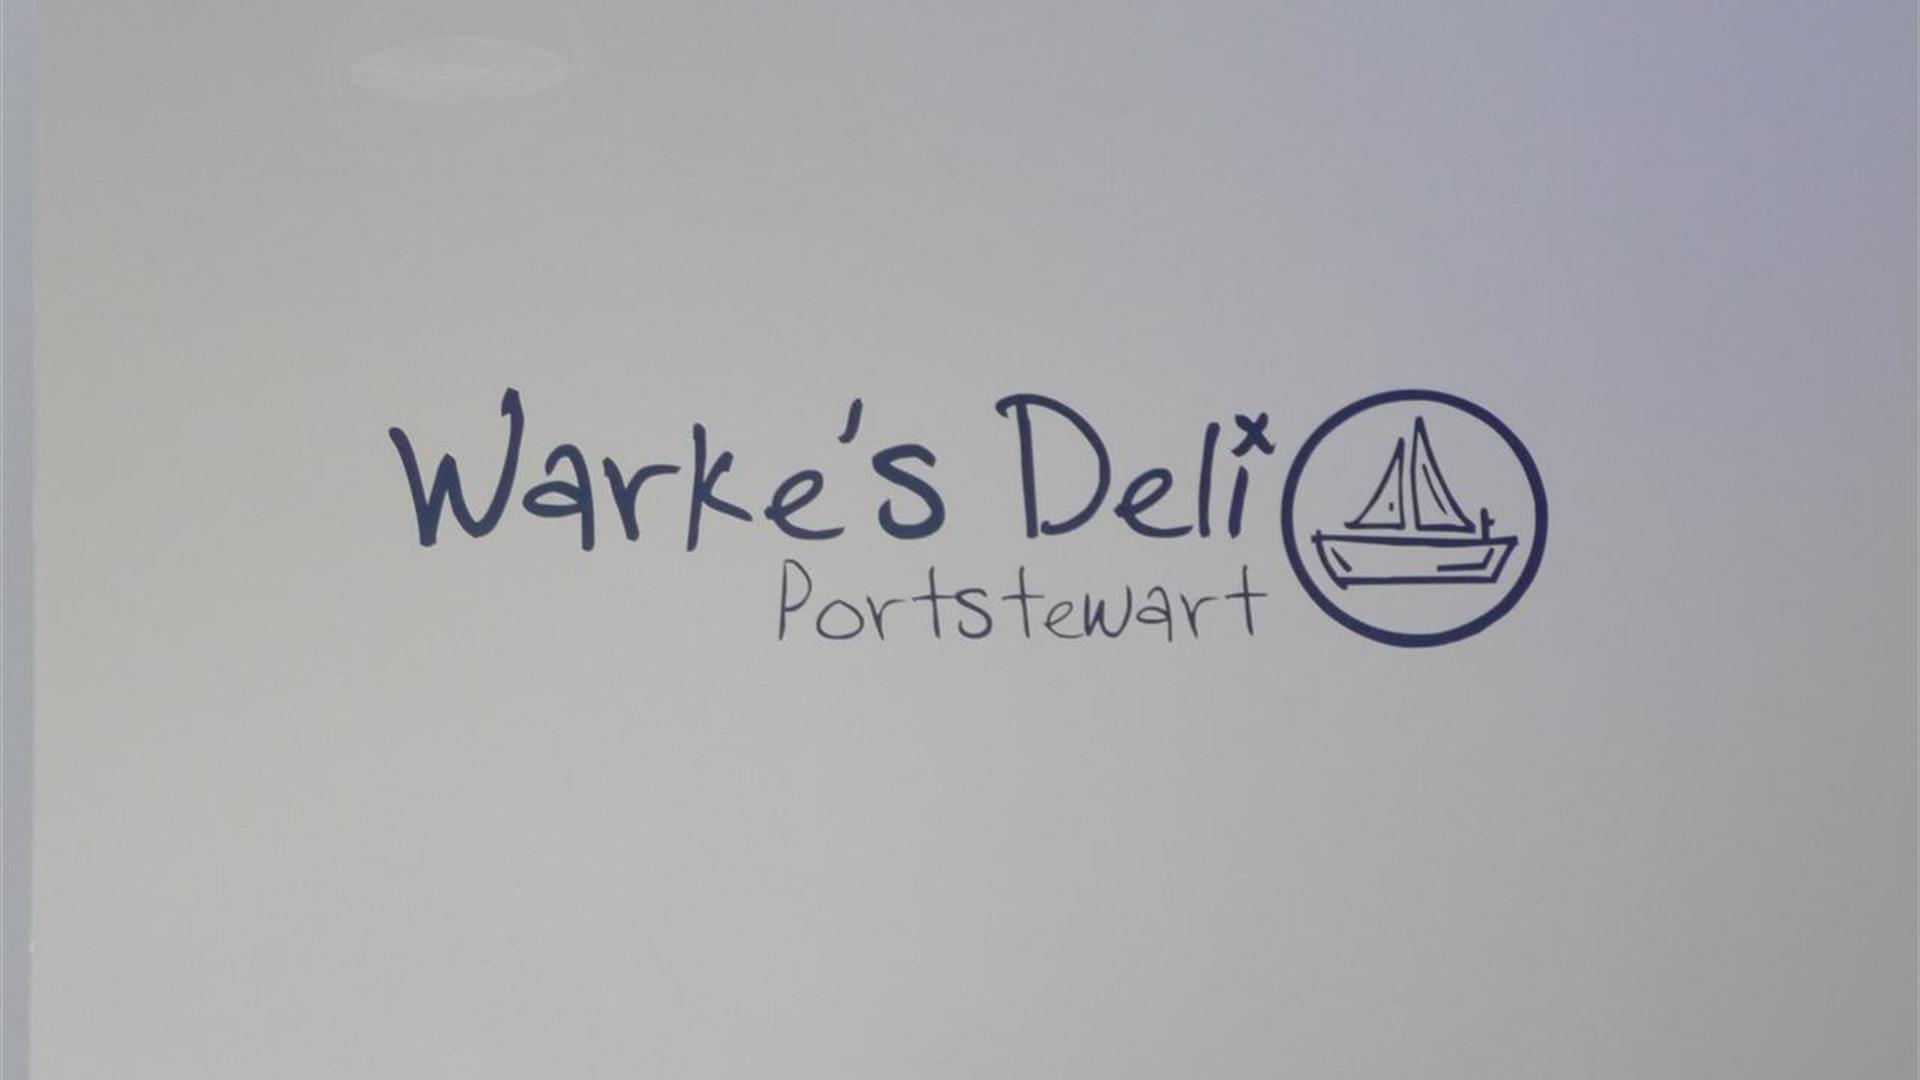 Warke's Deli